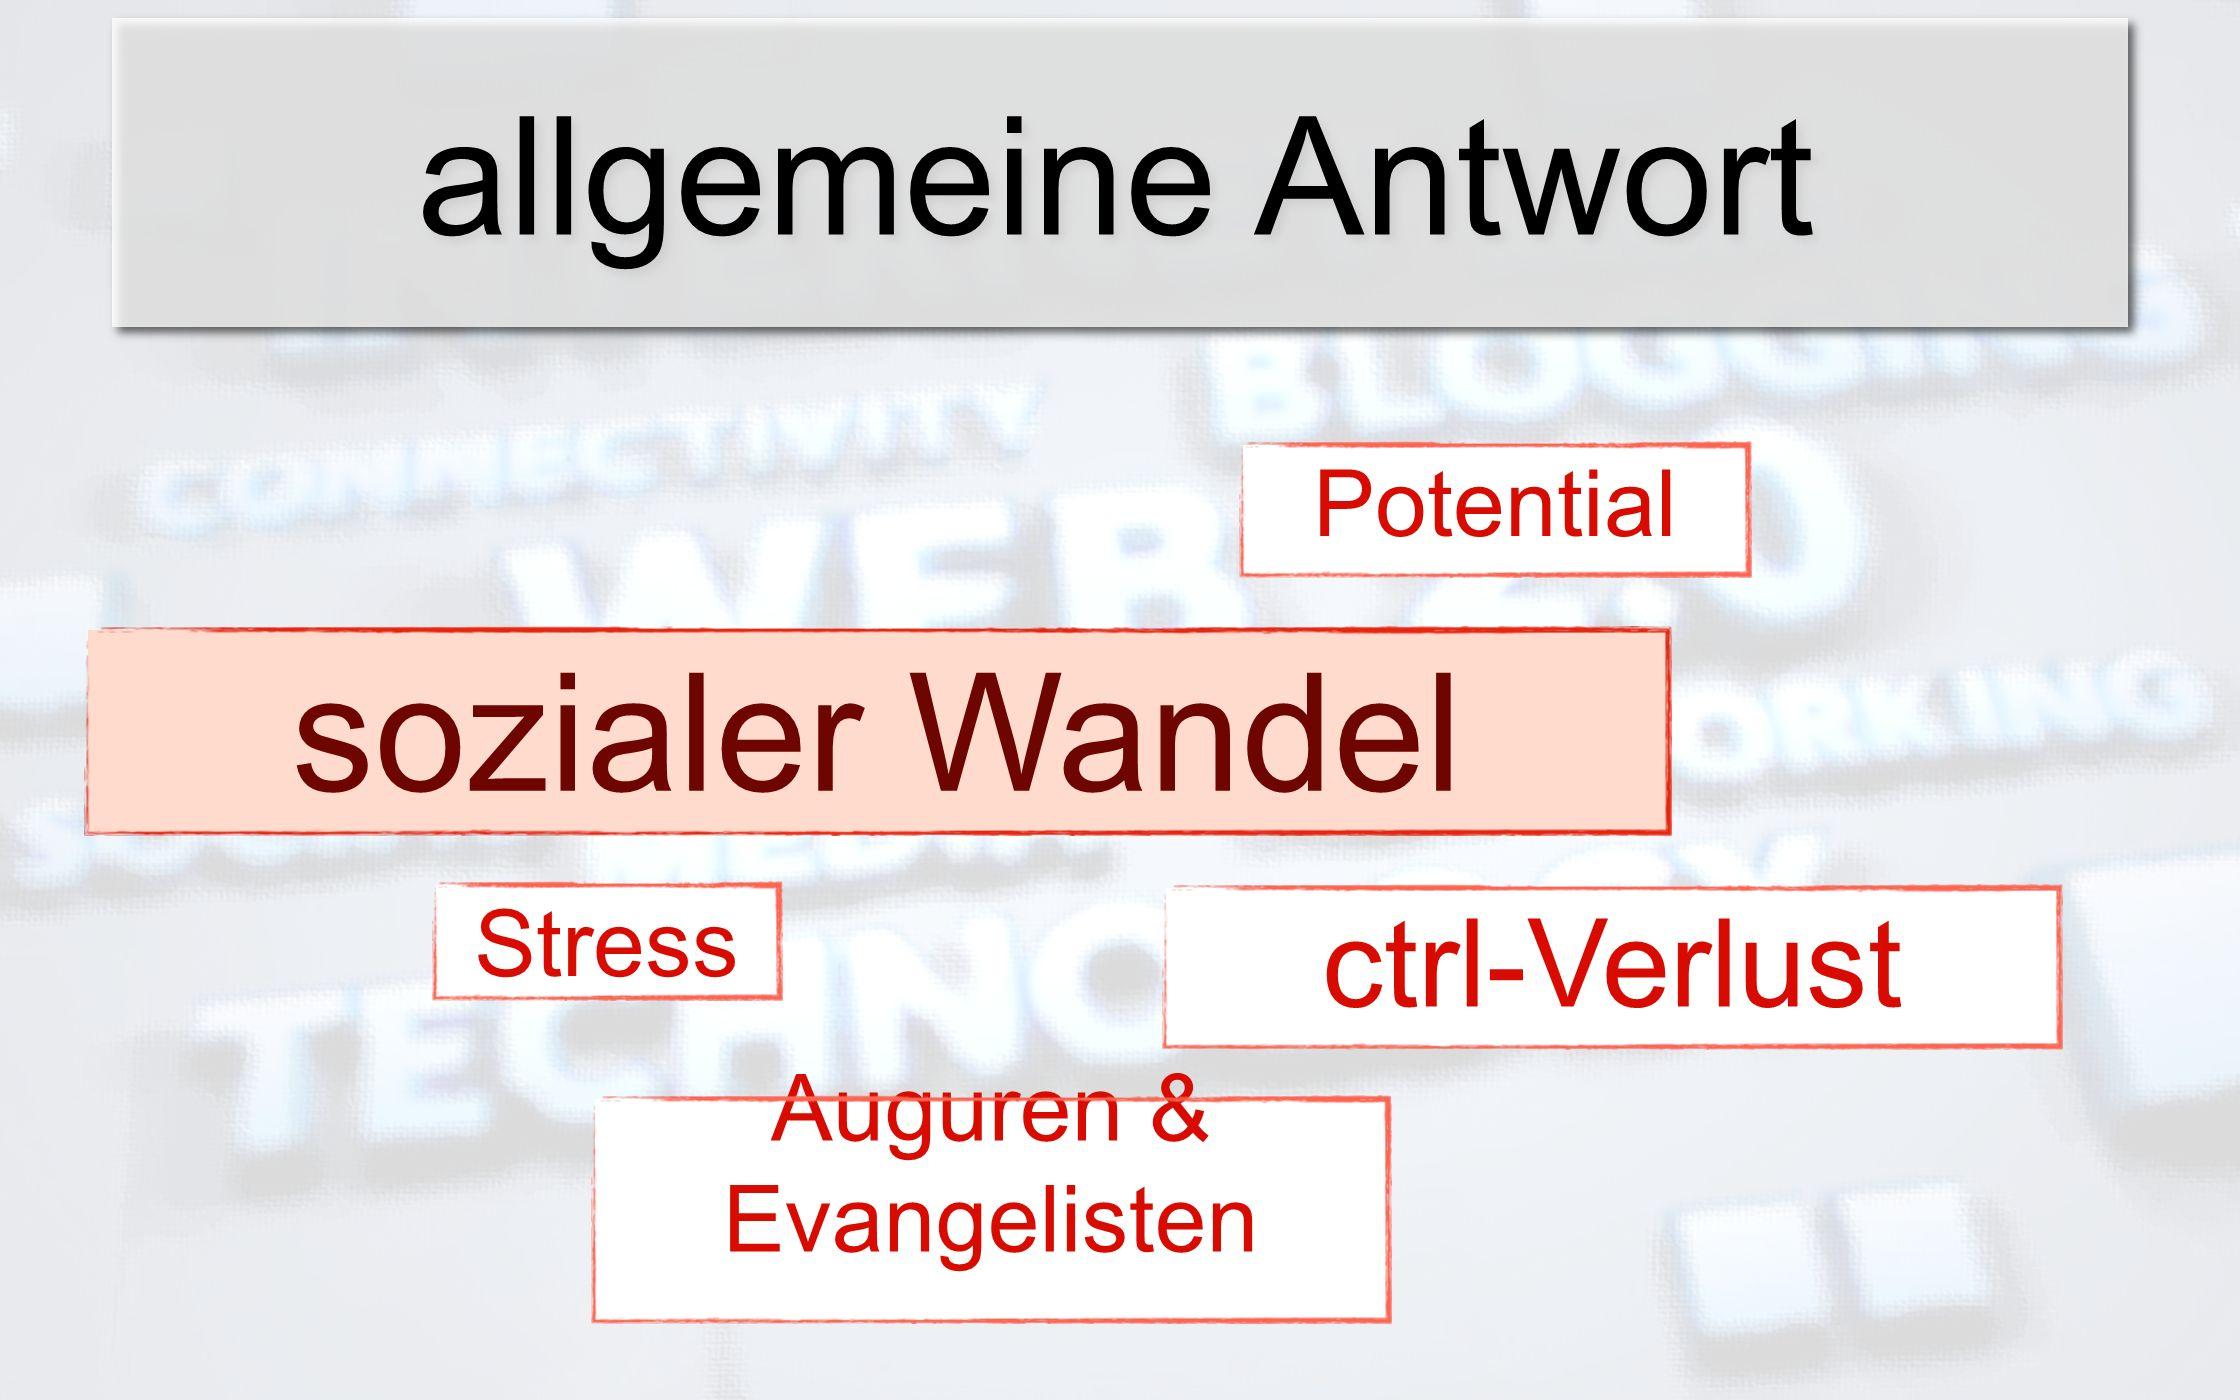 allgemeine Antwort sozialer Wandel ctrl-Verlust PotentialStress Auguren & Evangelisten